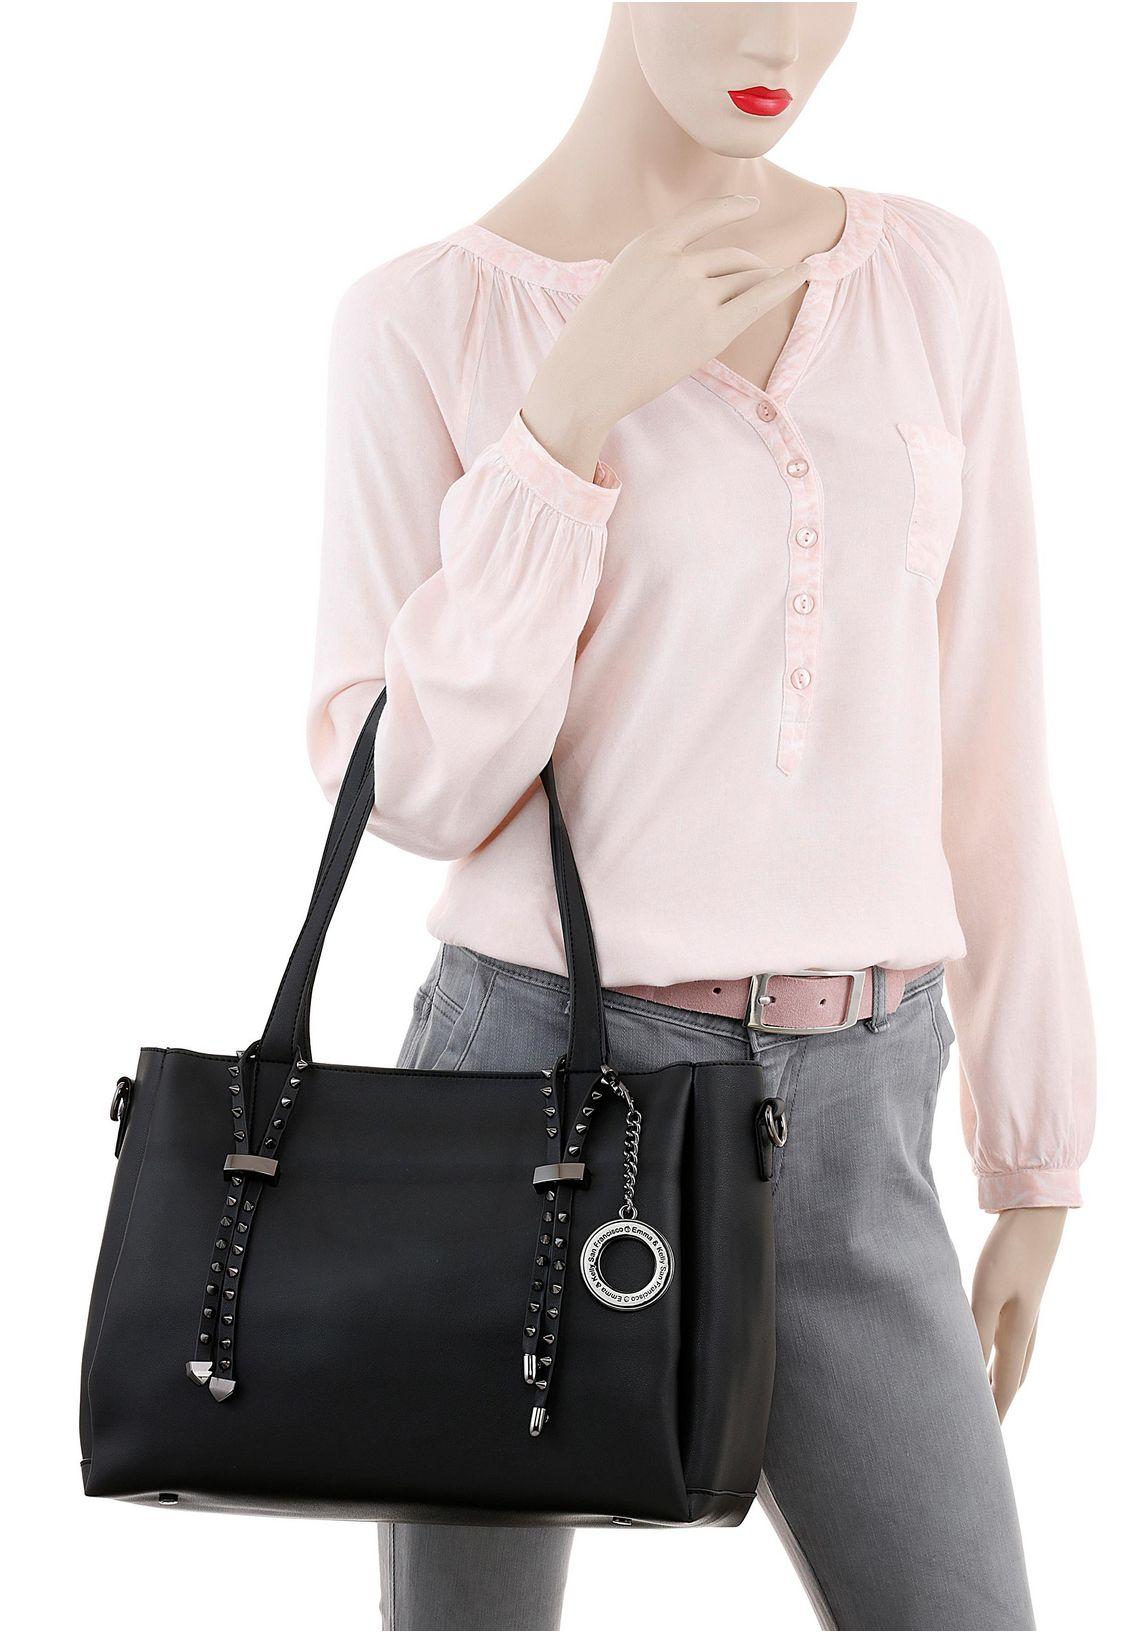 Emma & Kelly shopper online verkrijgbaar  zwart